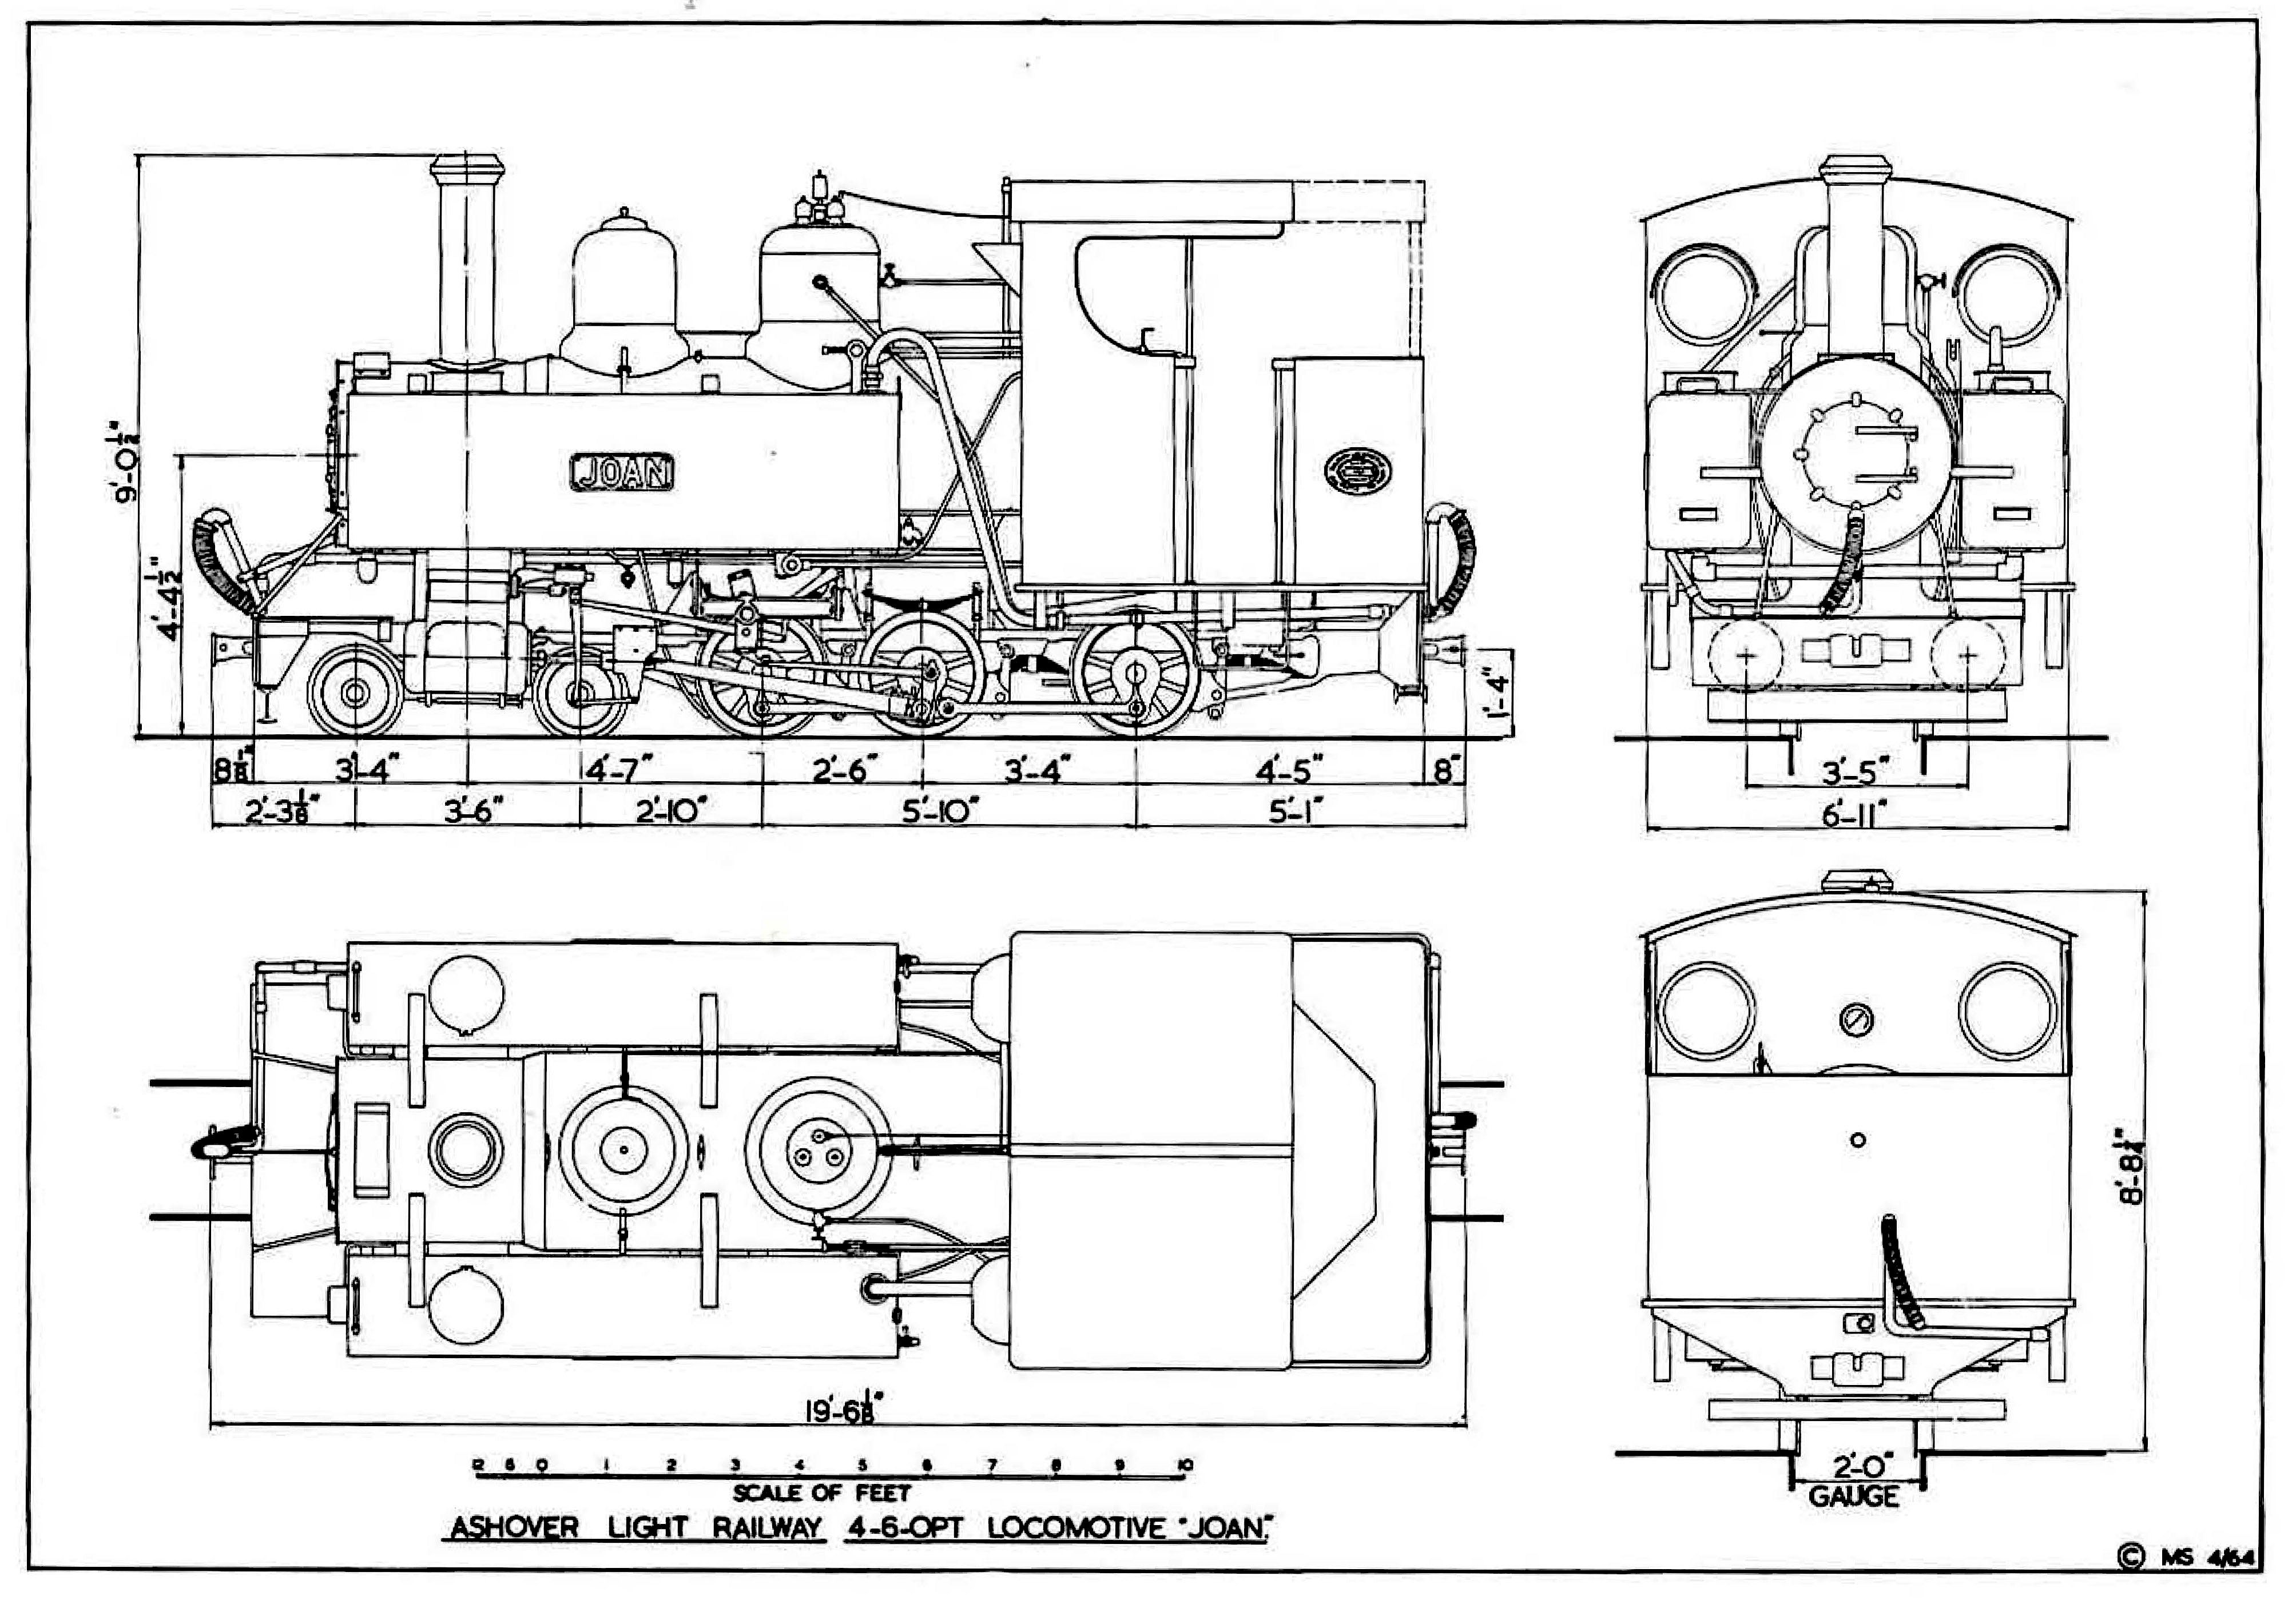 Line drawings of ALR Baldwin 4-6-0PT locomotive 'Joan